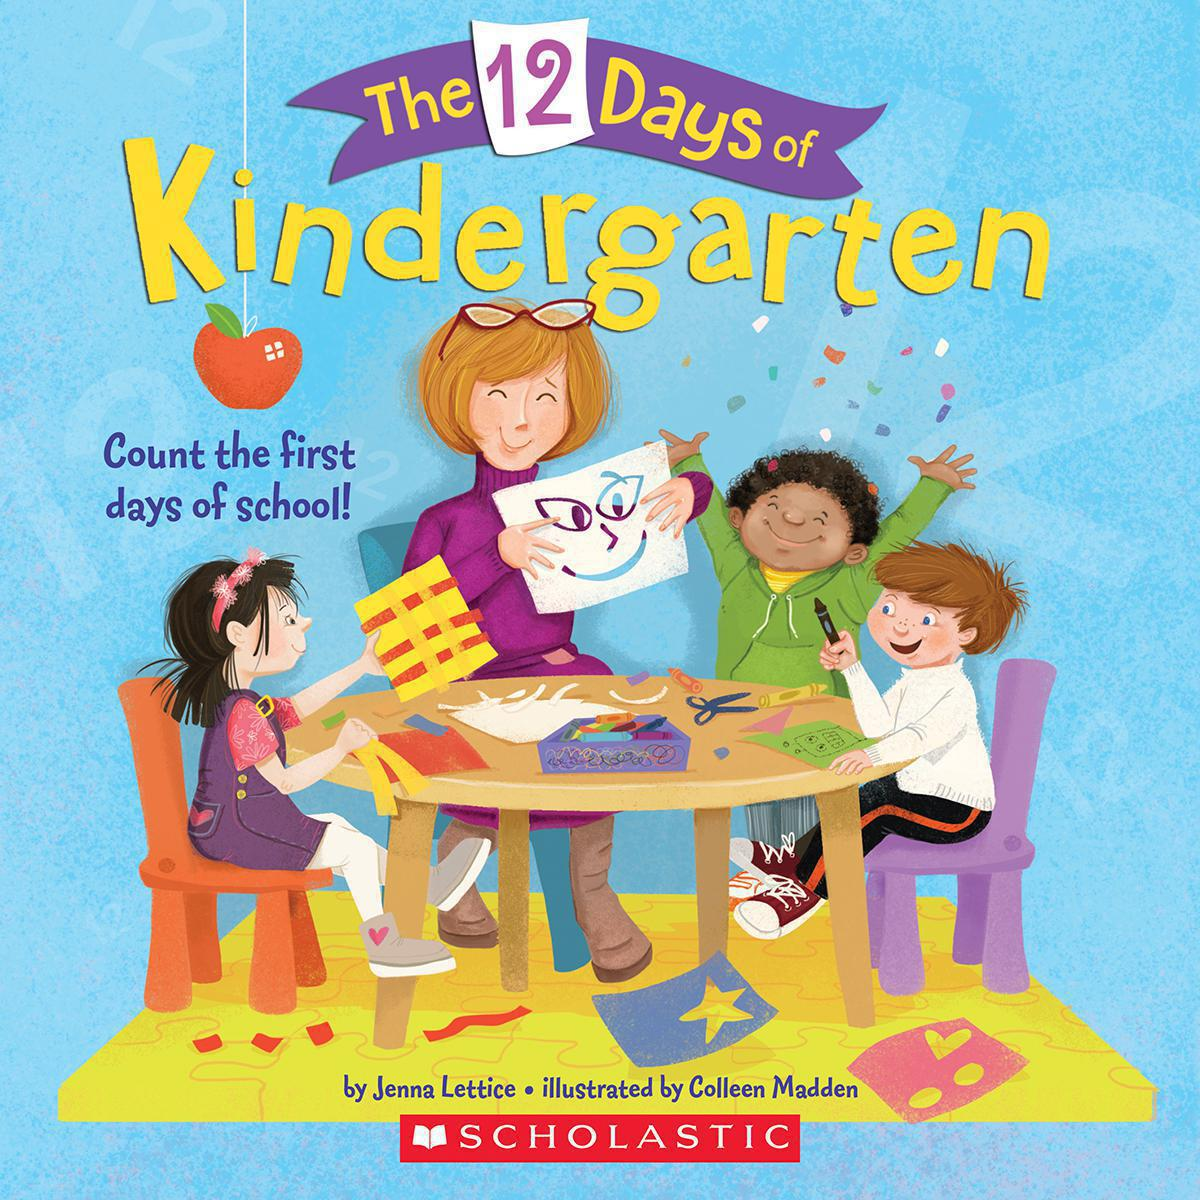 The 12 Days of Kindergarten 10-Pack